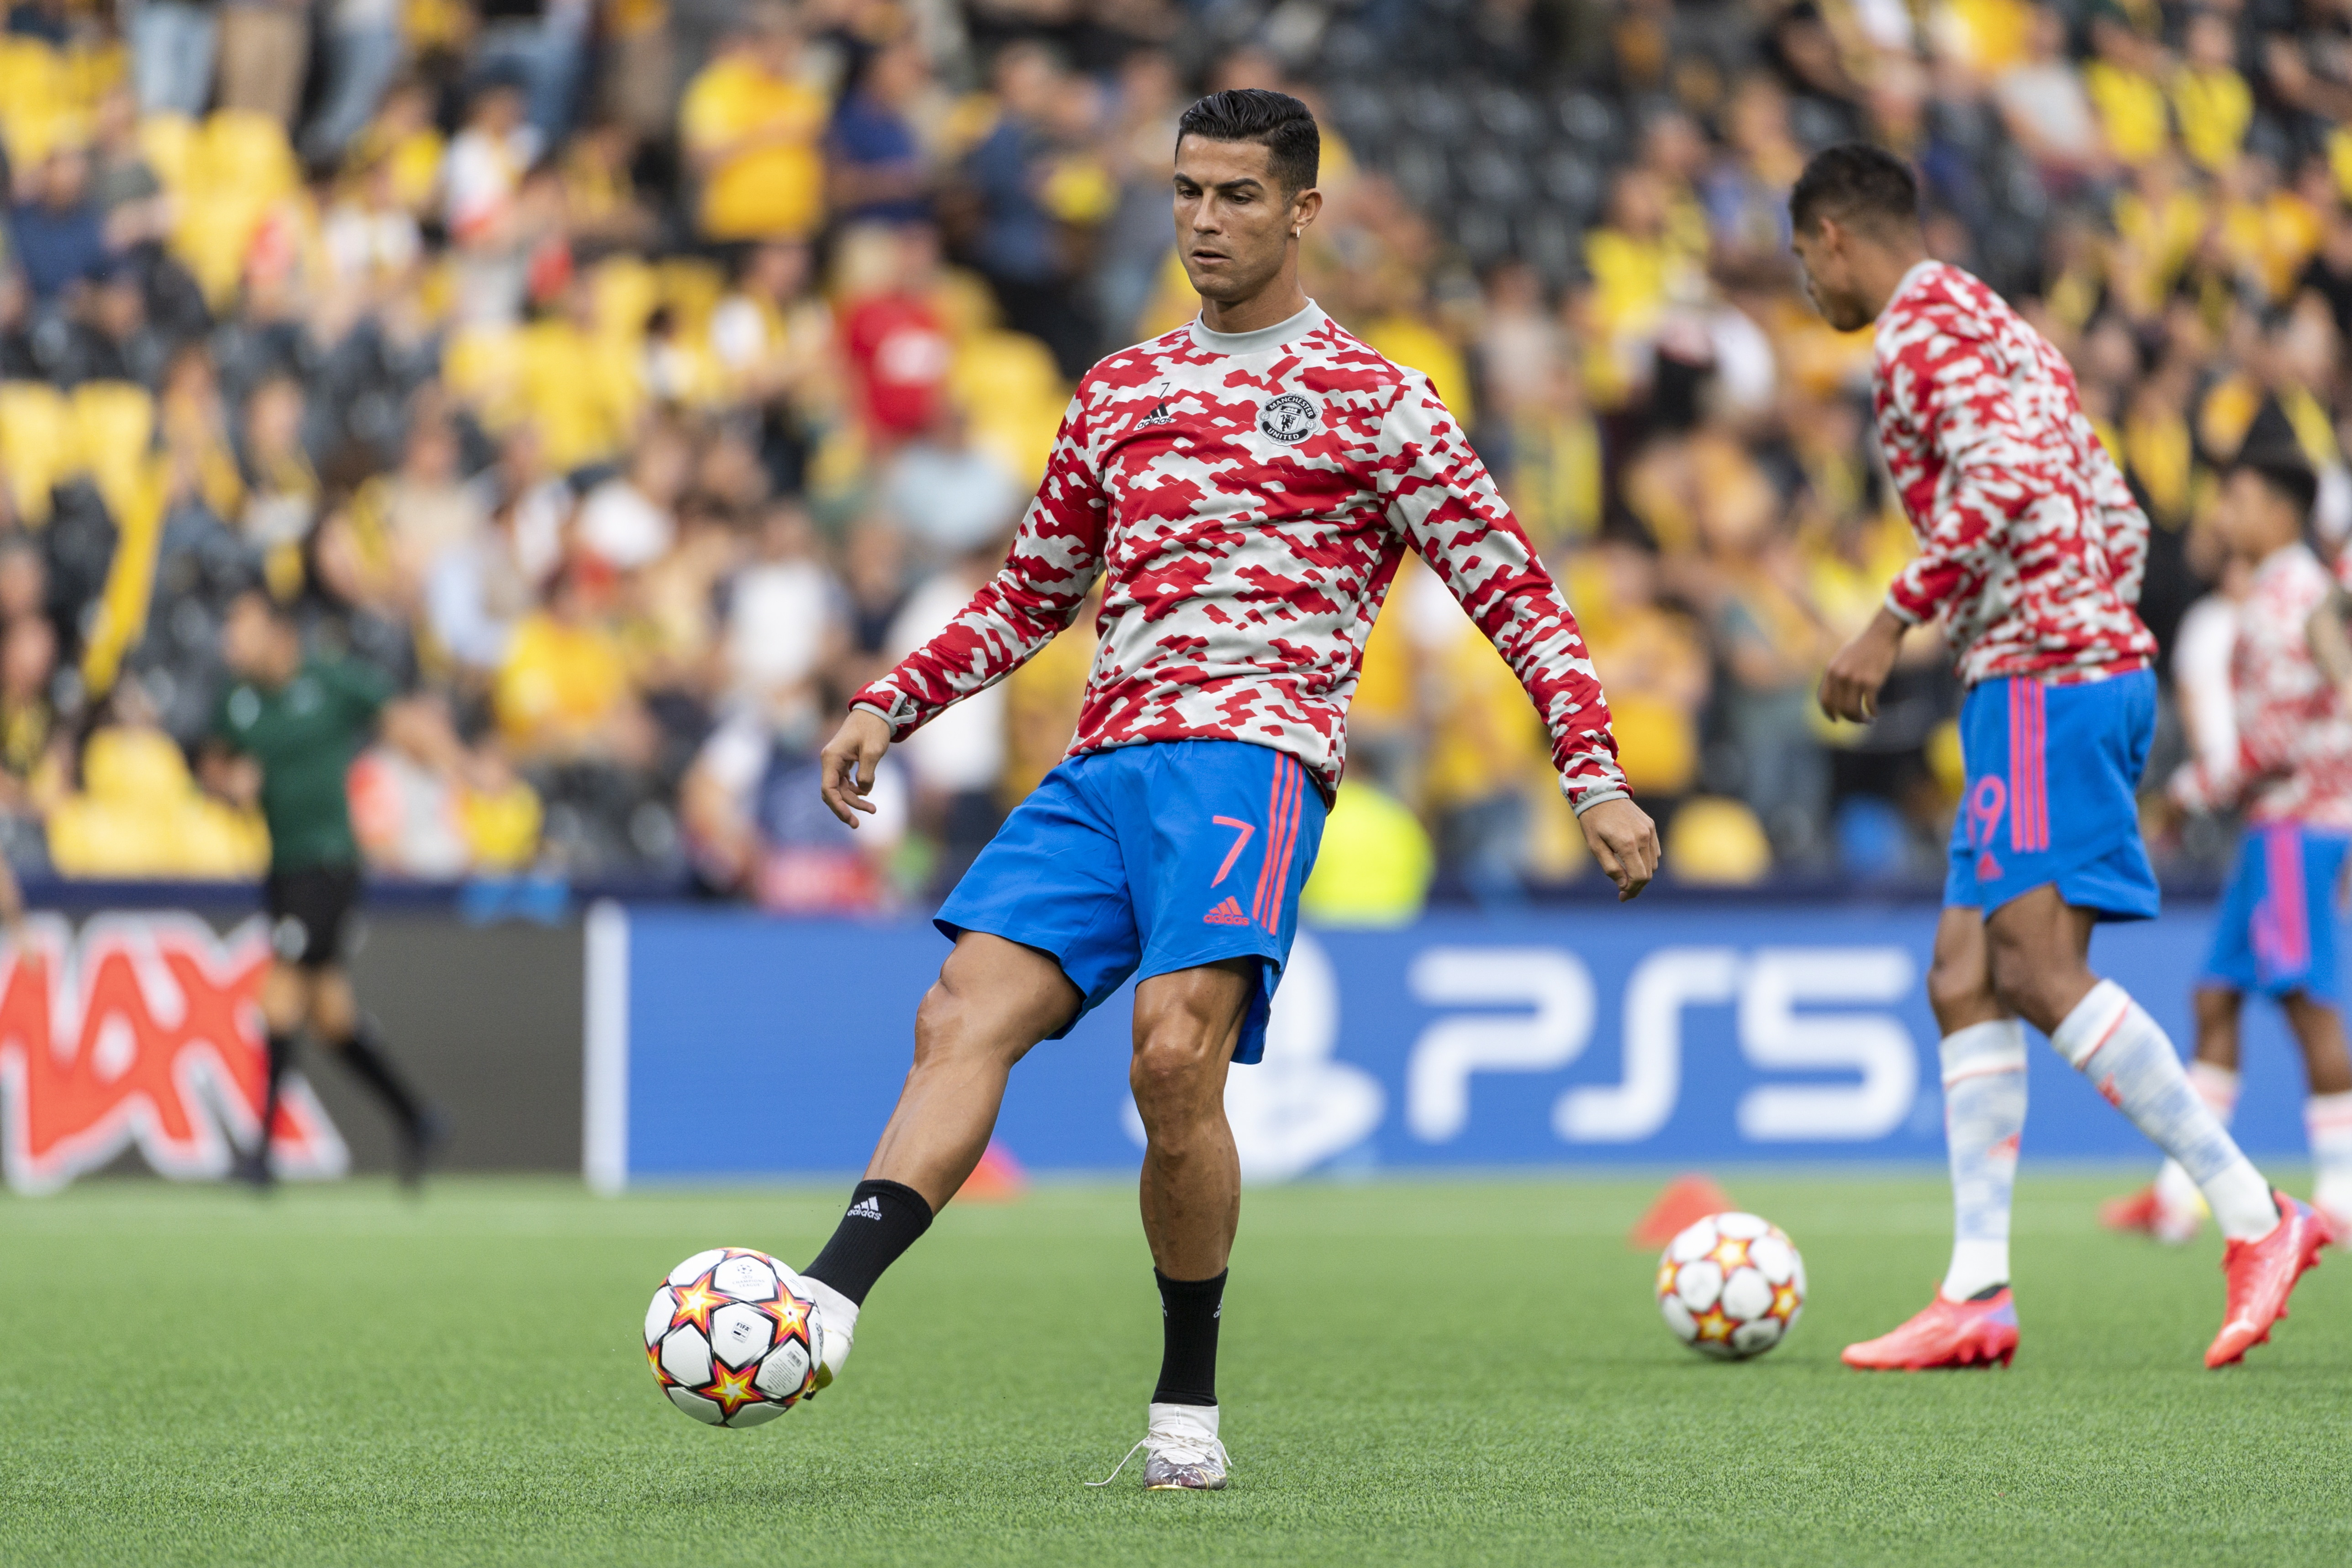 Cum a fost Cristiano Ronaldo escrocat de aproape 300.000 de euro